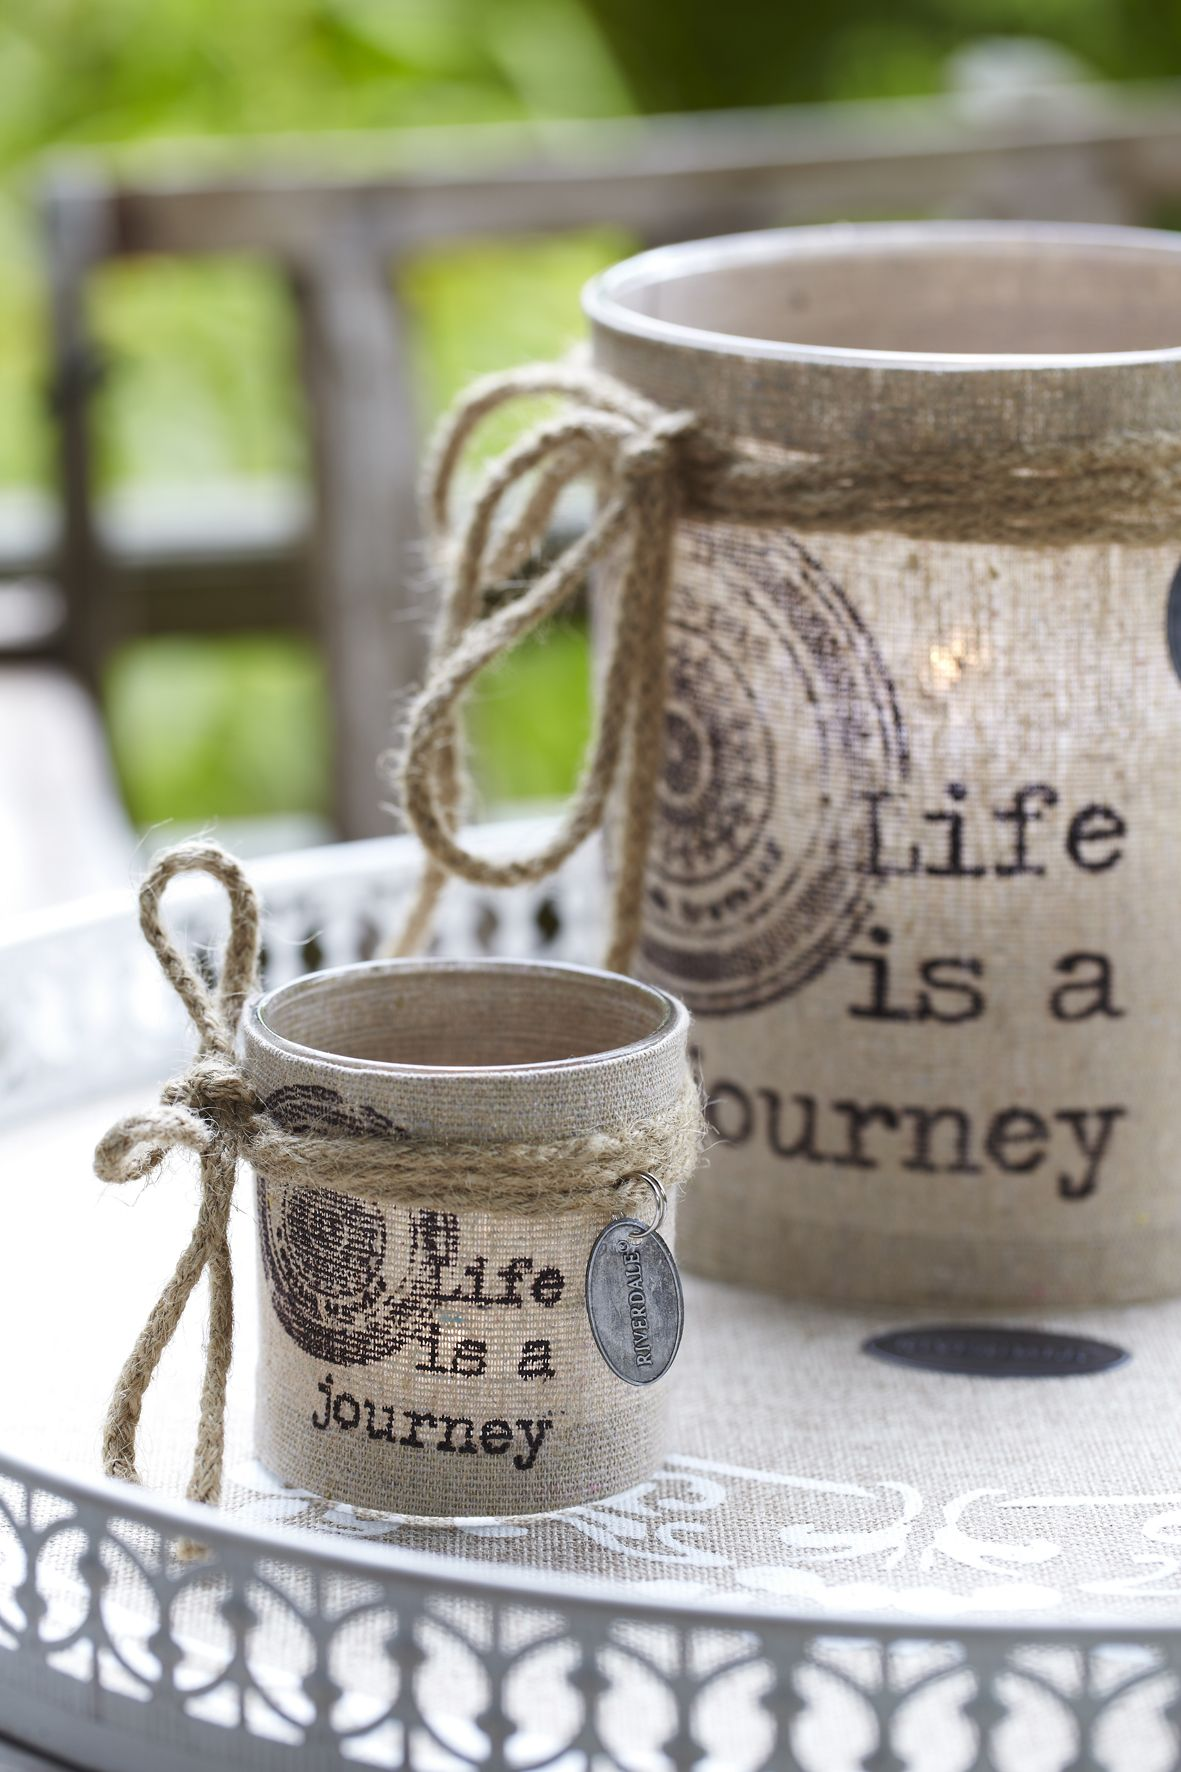 Burlap Crafts Five Amazing Burlap Crafts Jars Gossip News And In Kitchen